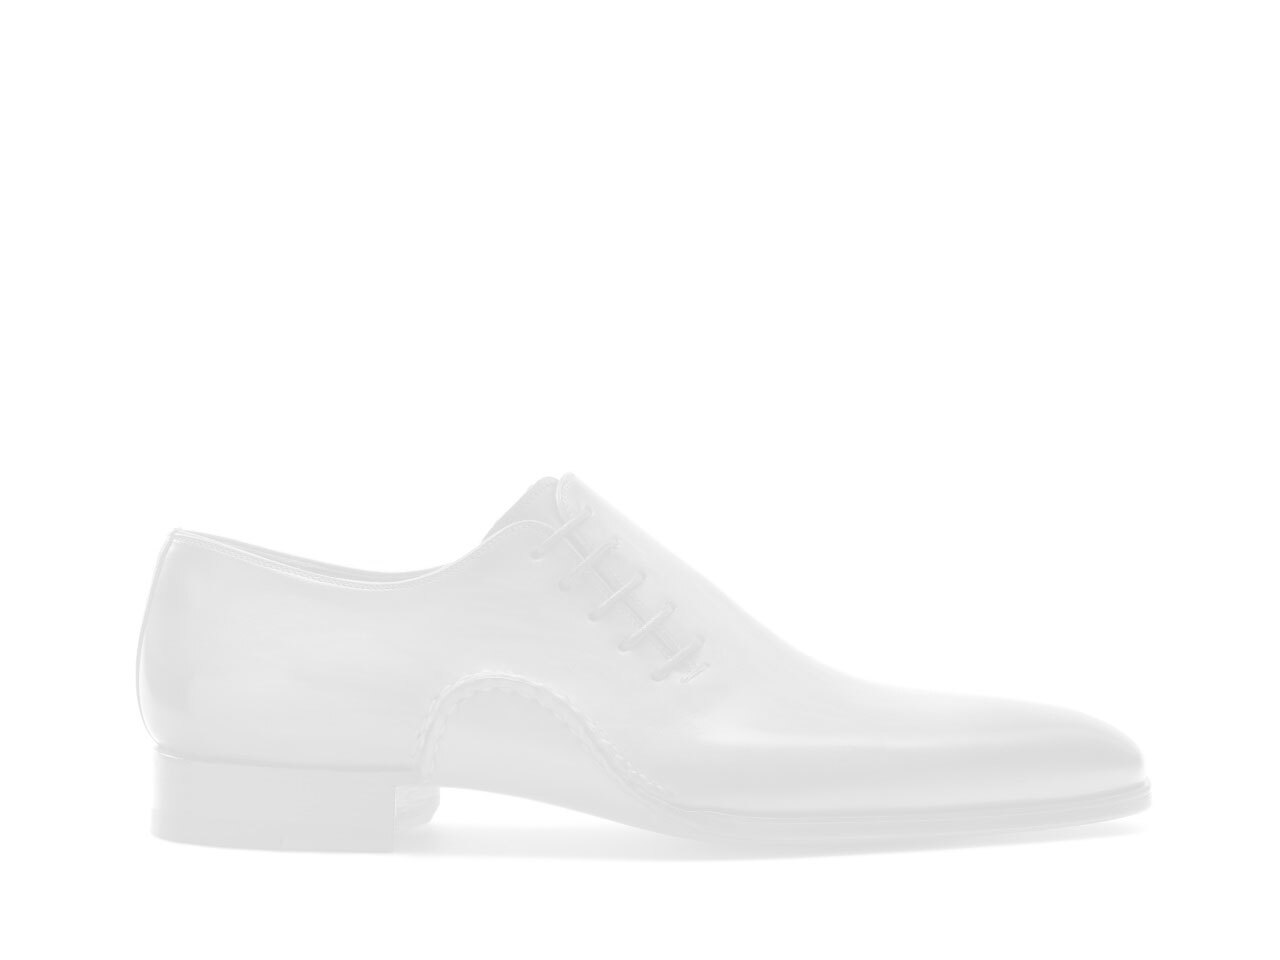 Pair of the Magnanni Quesada Navy Men's Driving Shoes